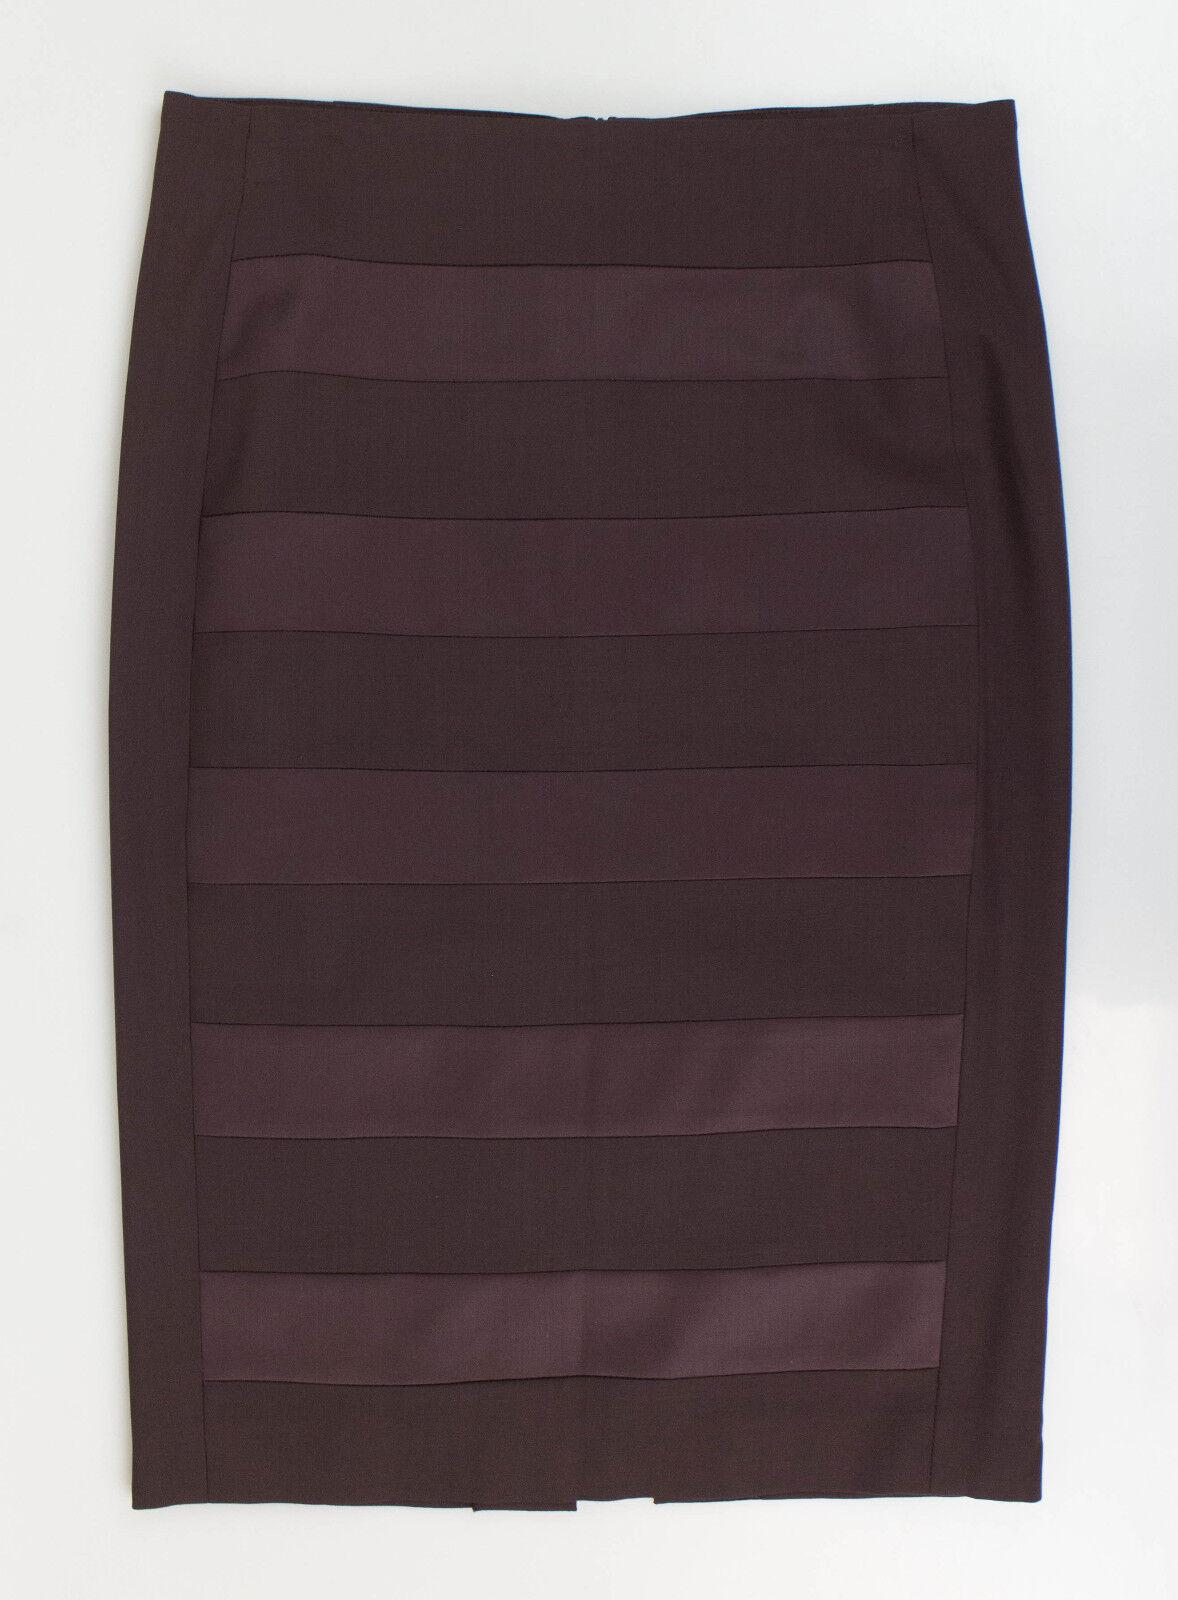 New. BRUNELLO CUCINELLI Brown Wool Blend Pencil Skirt Size 2 38